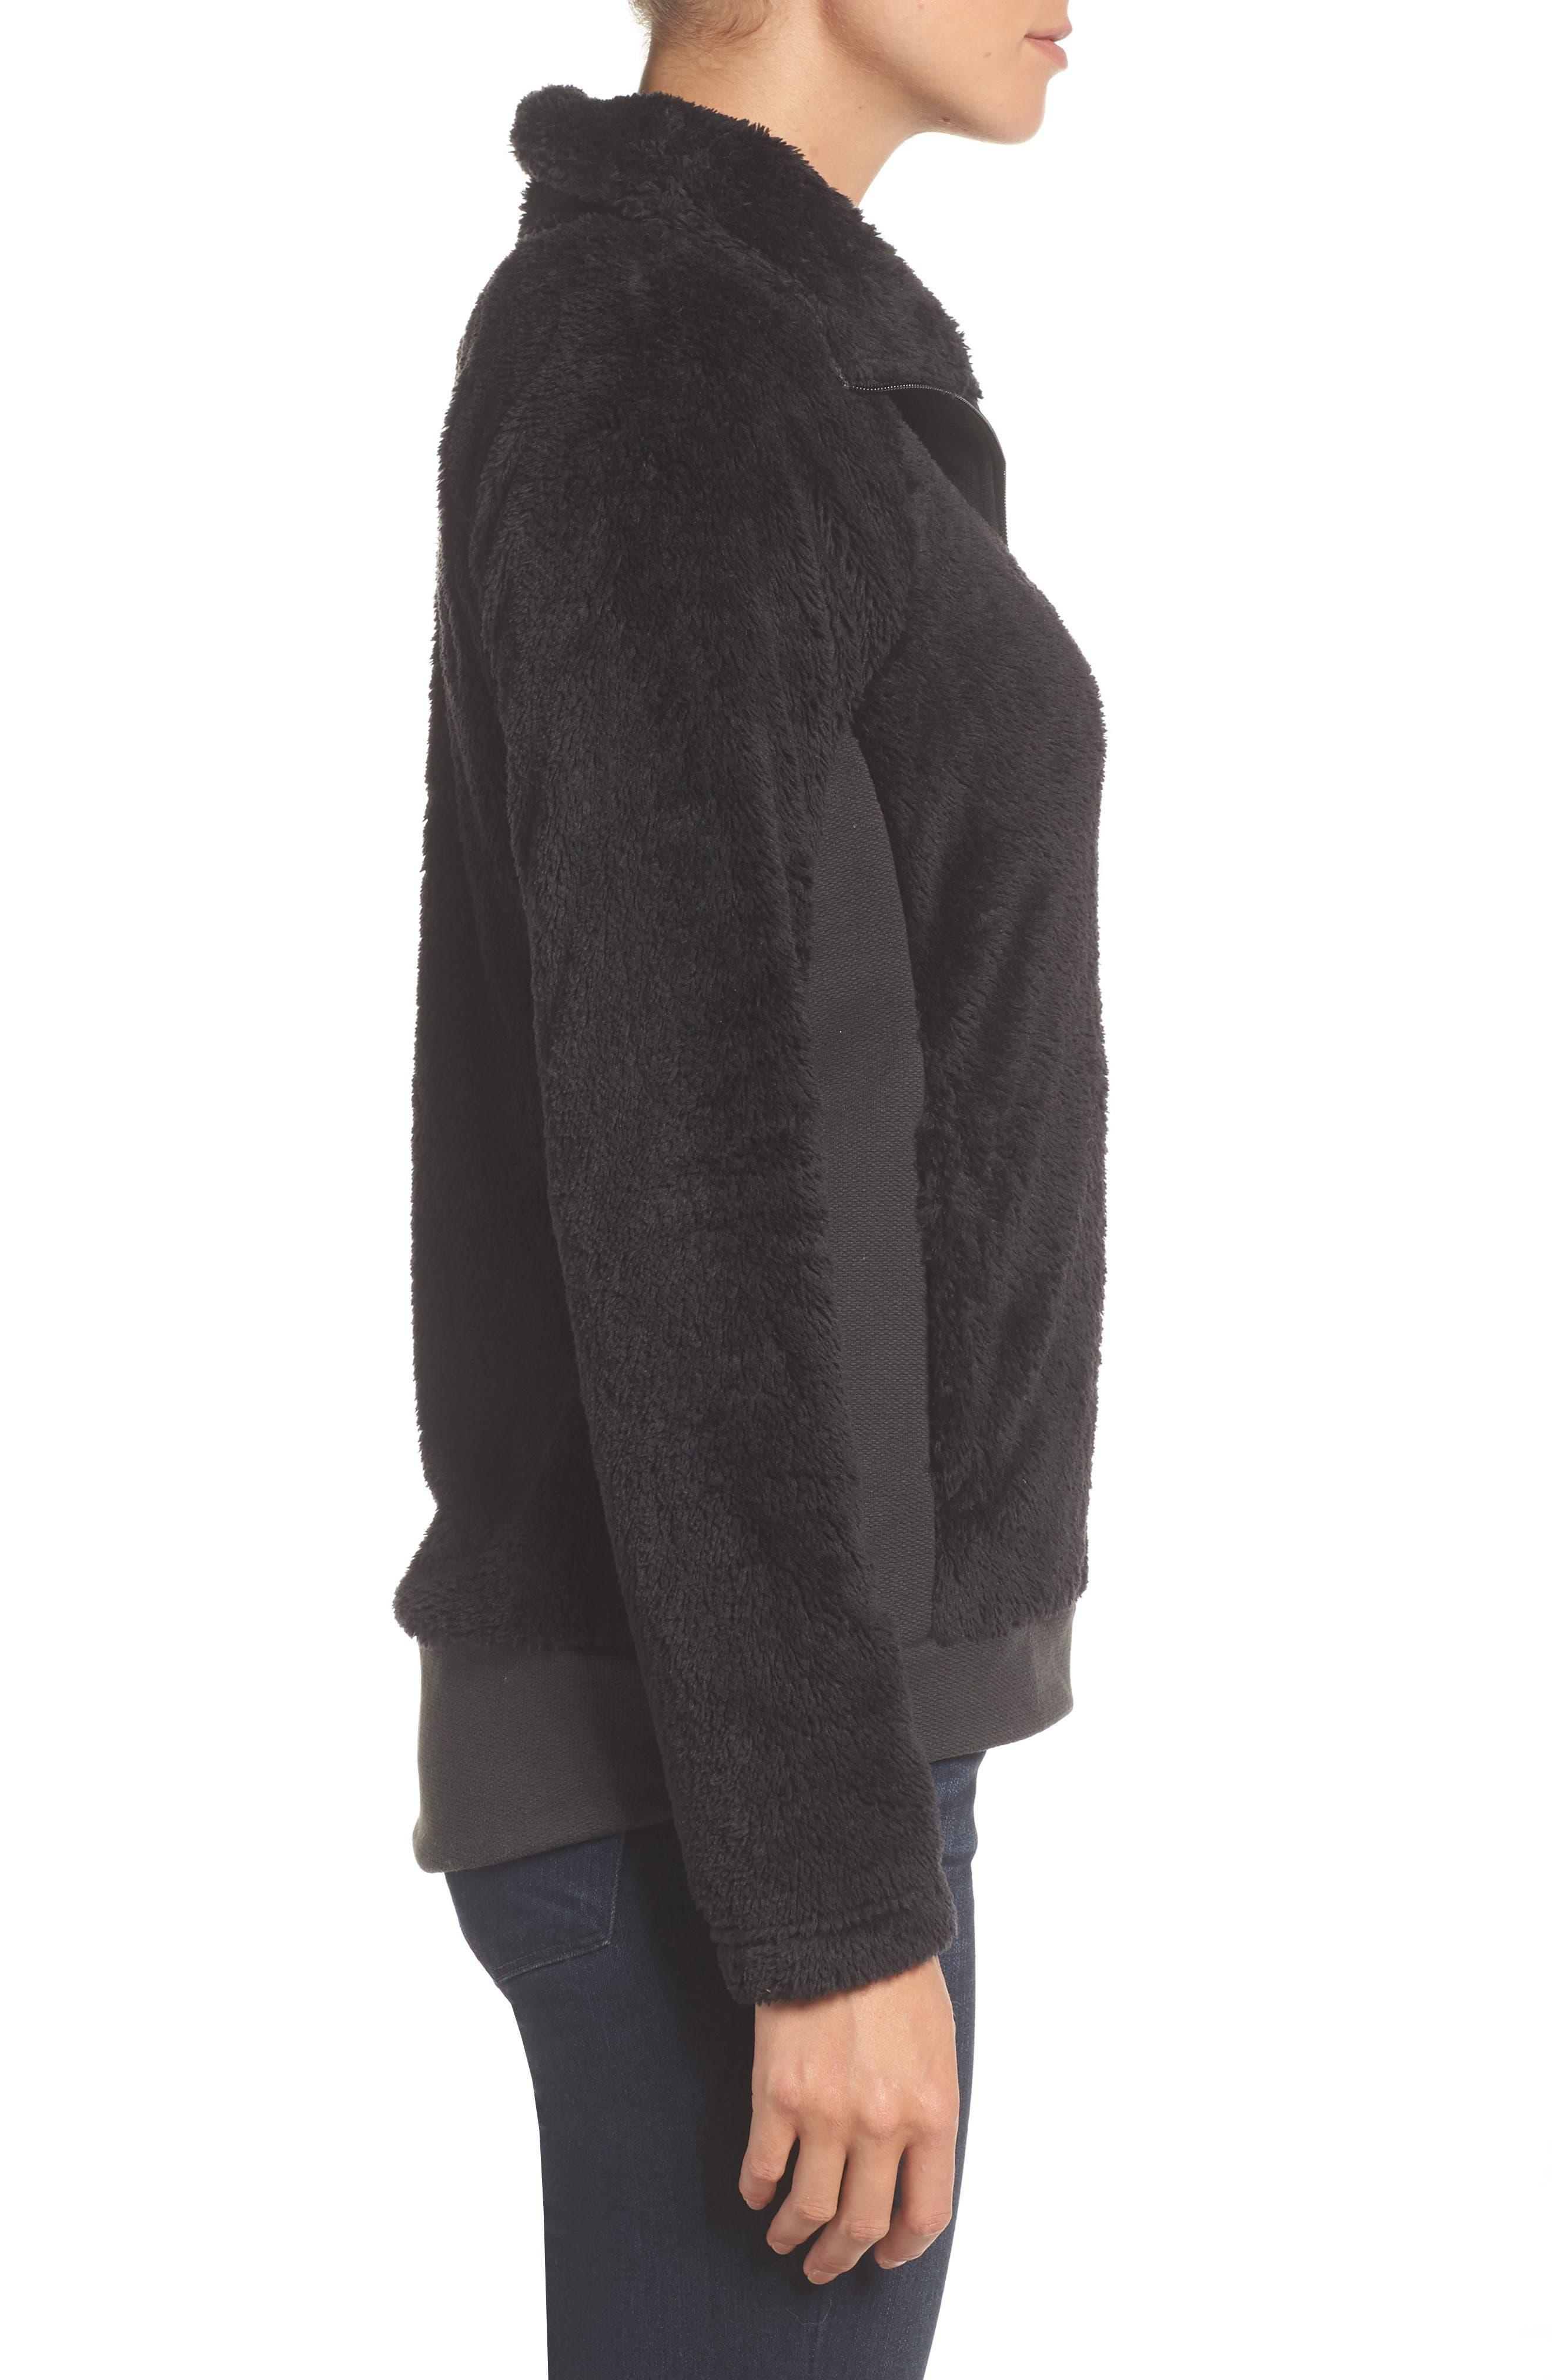 Furry Fleece Jacket,                             Alternate thumbnail 3, color,                             TNF BLACK